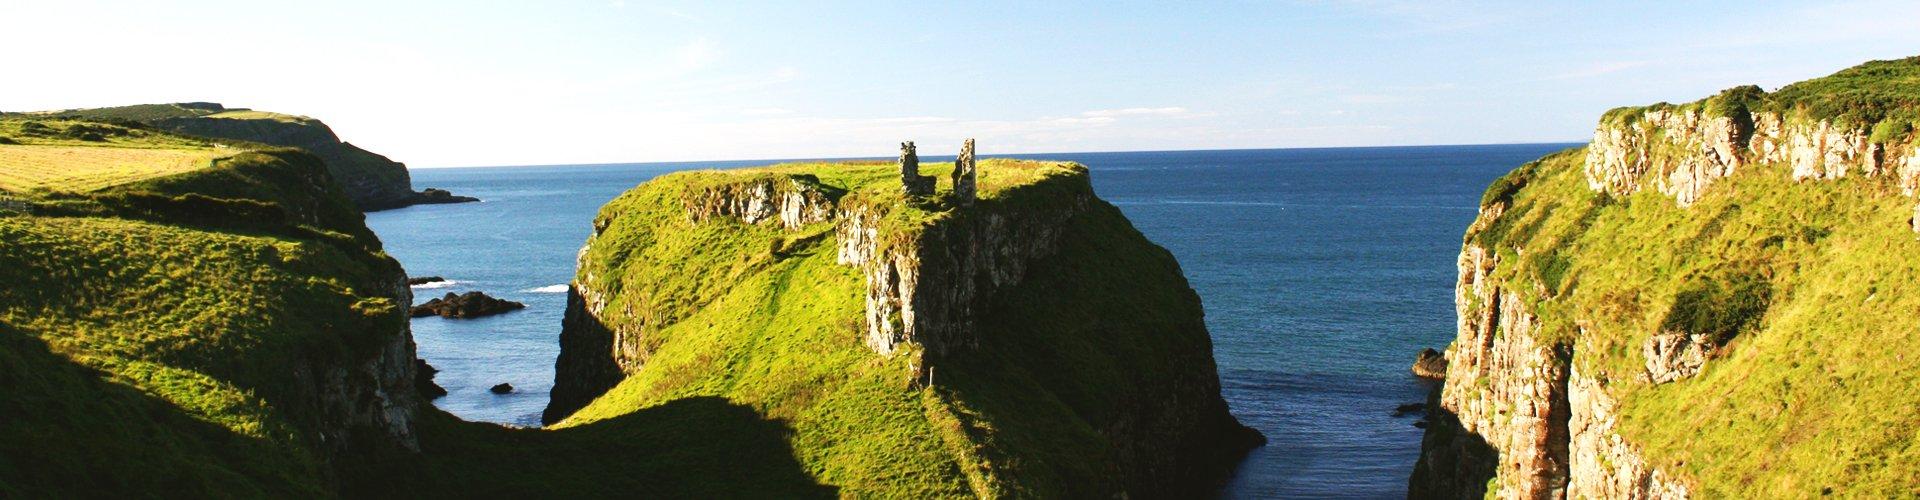 Kust van Noord-Ierland